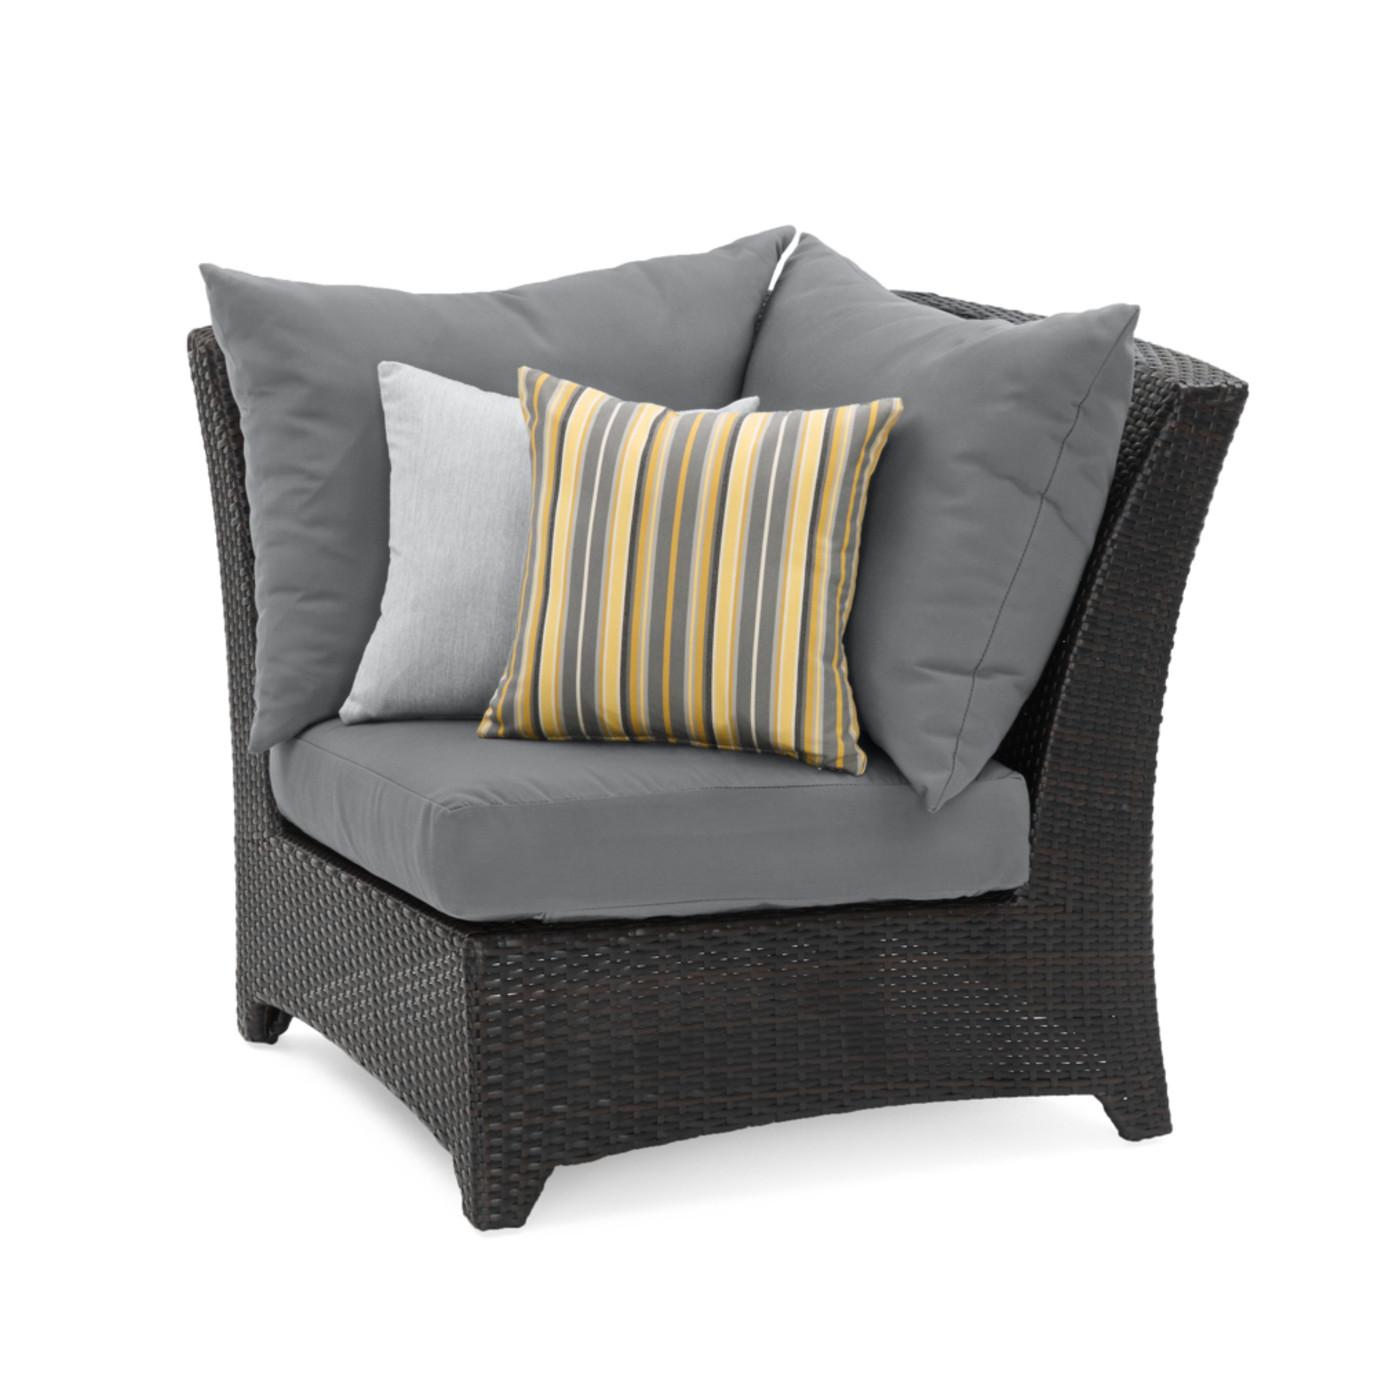 Deco™ Corner Chair - Charcoal Grey